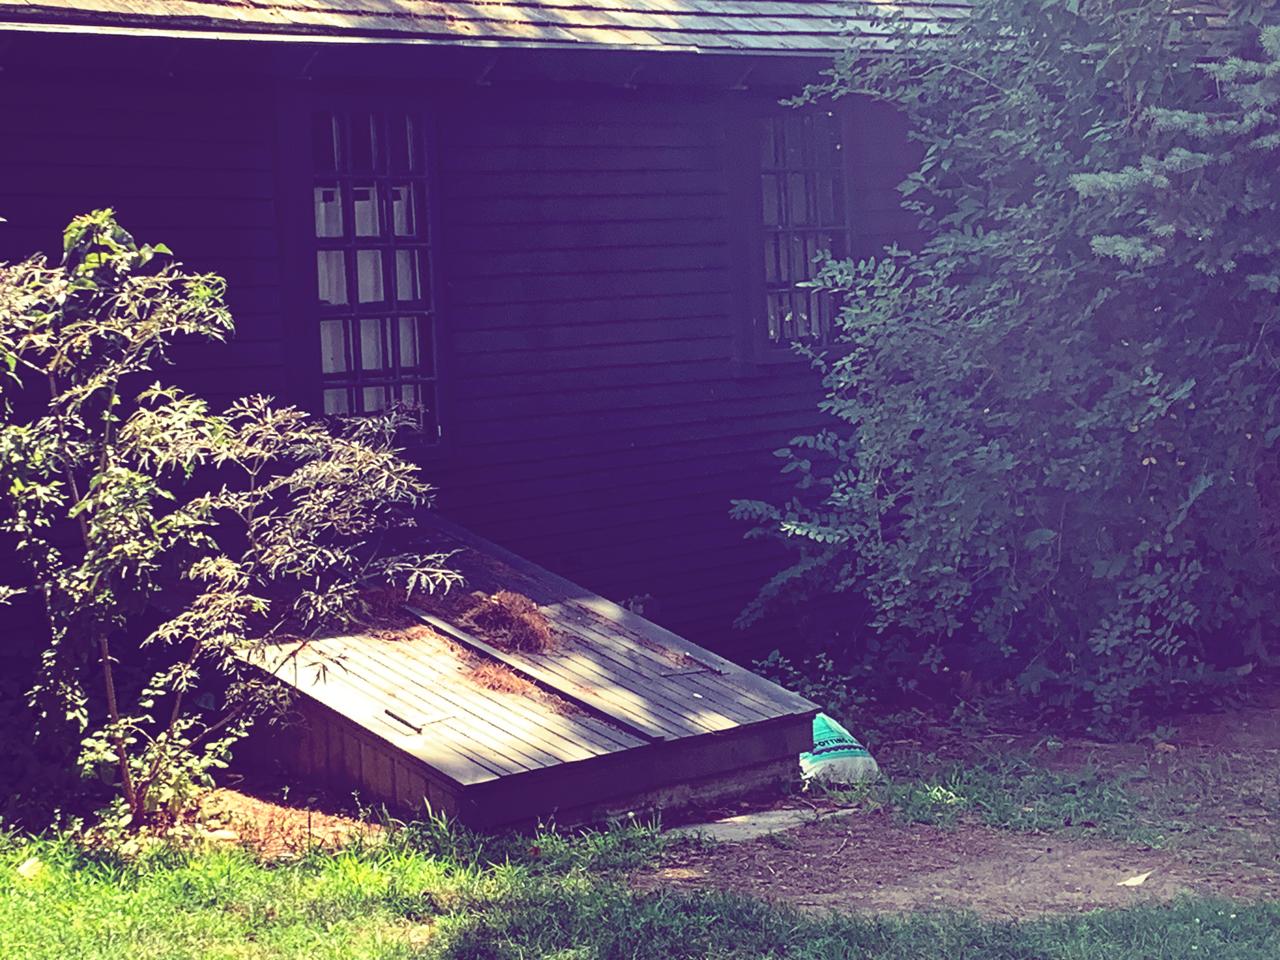 witch-house-salem-massachusetts-1280x960-05